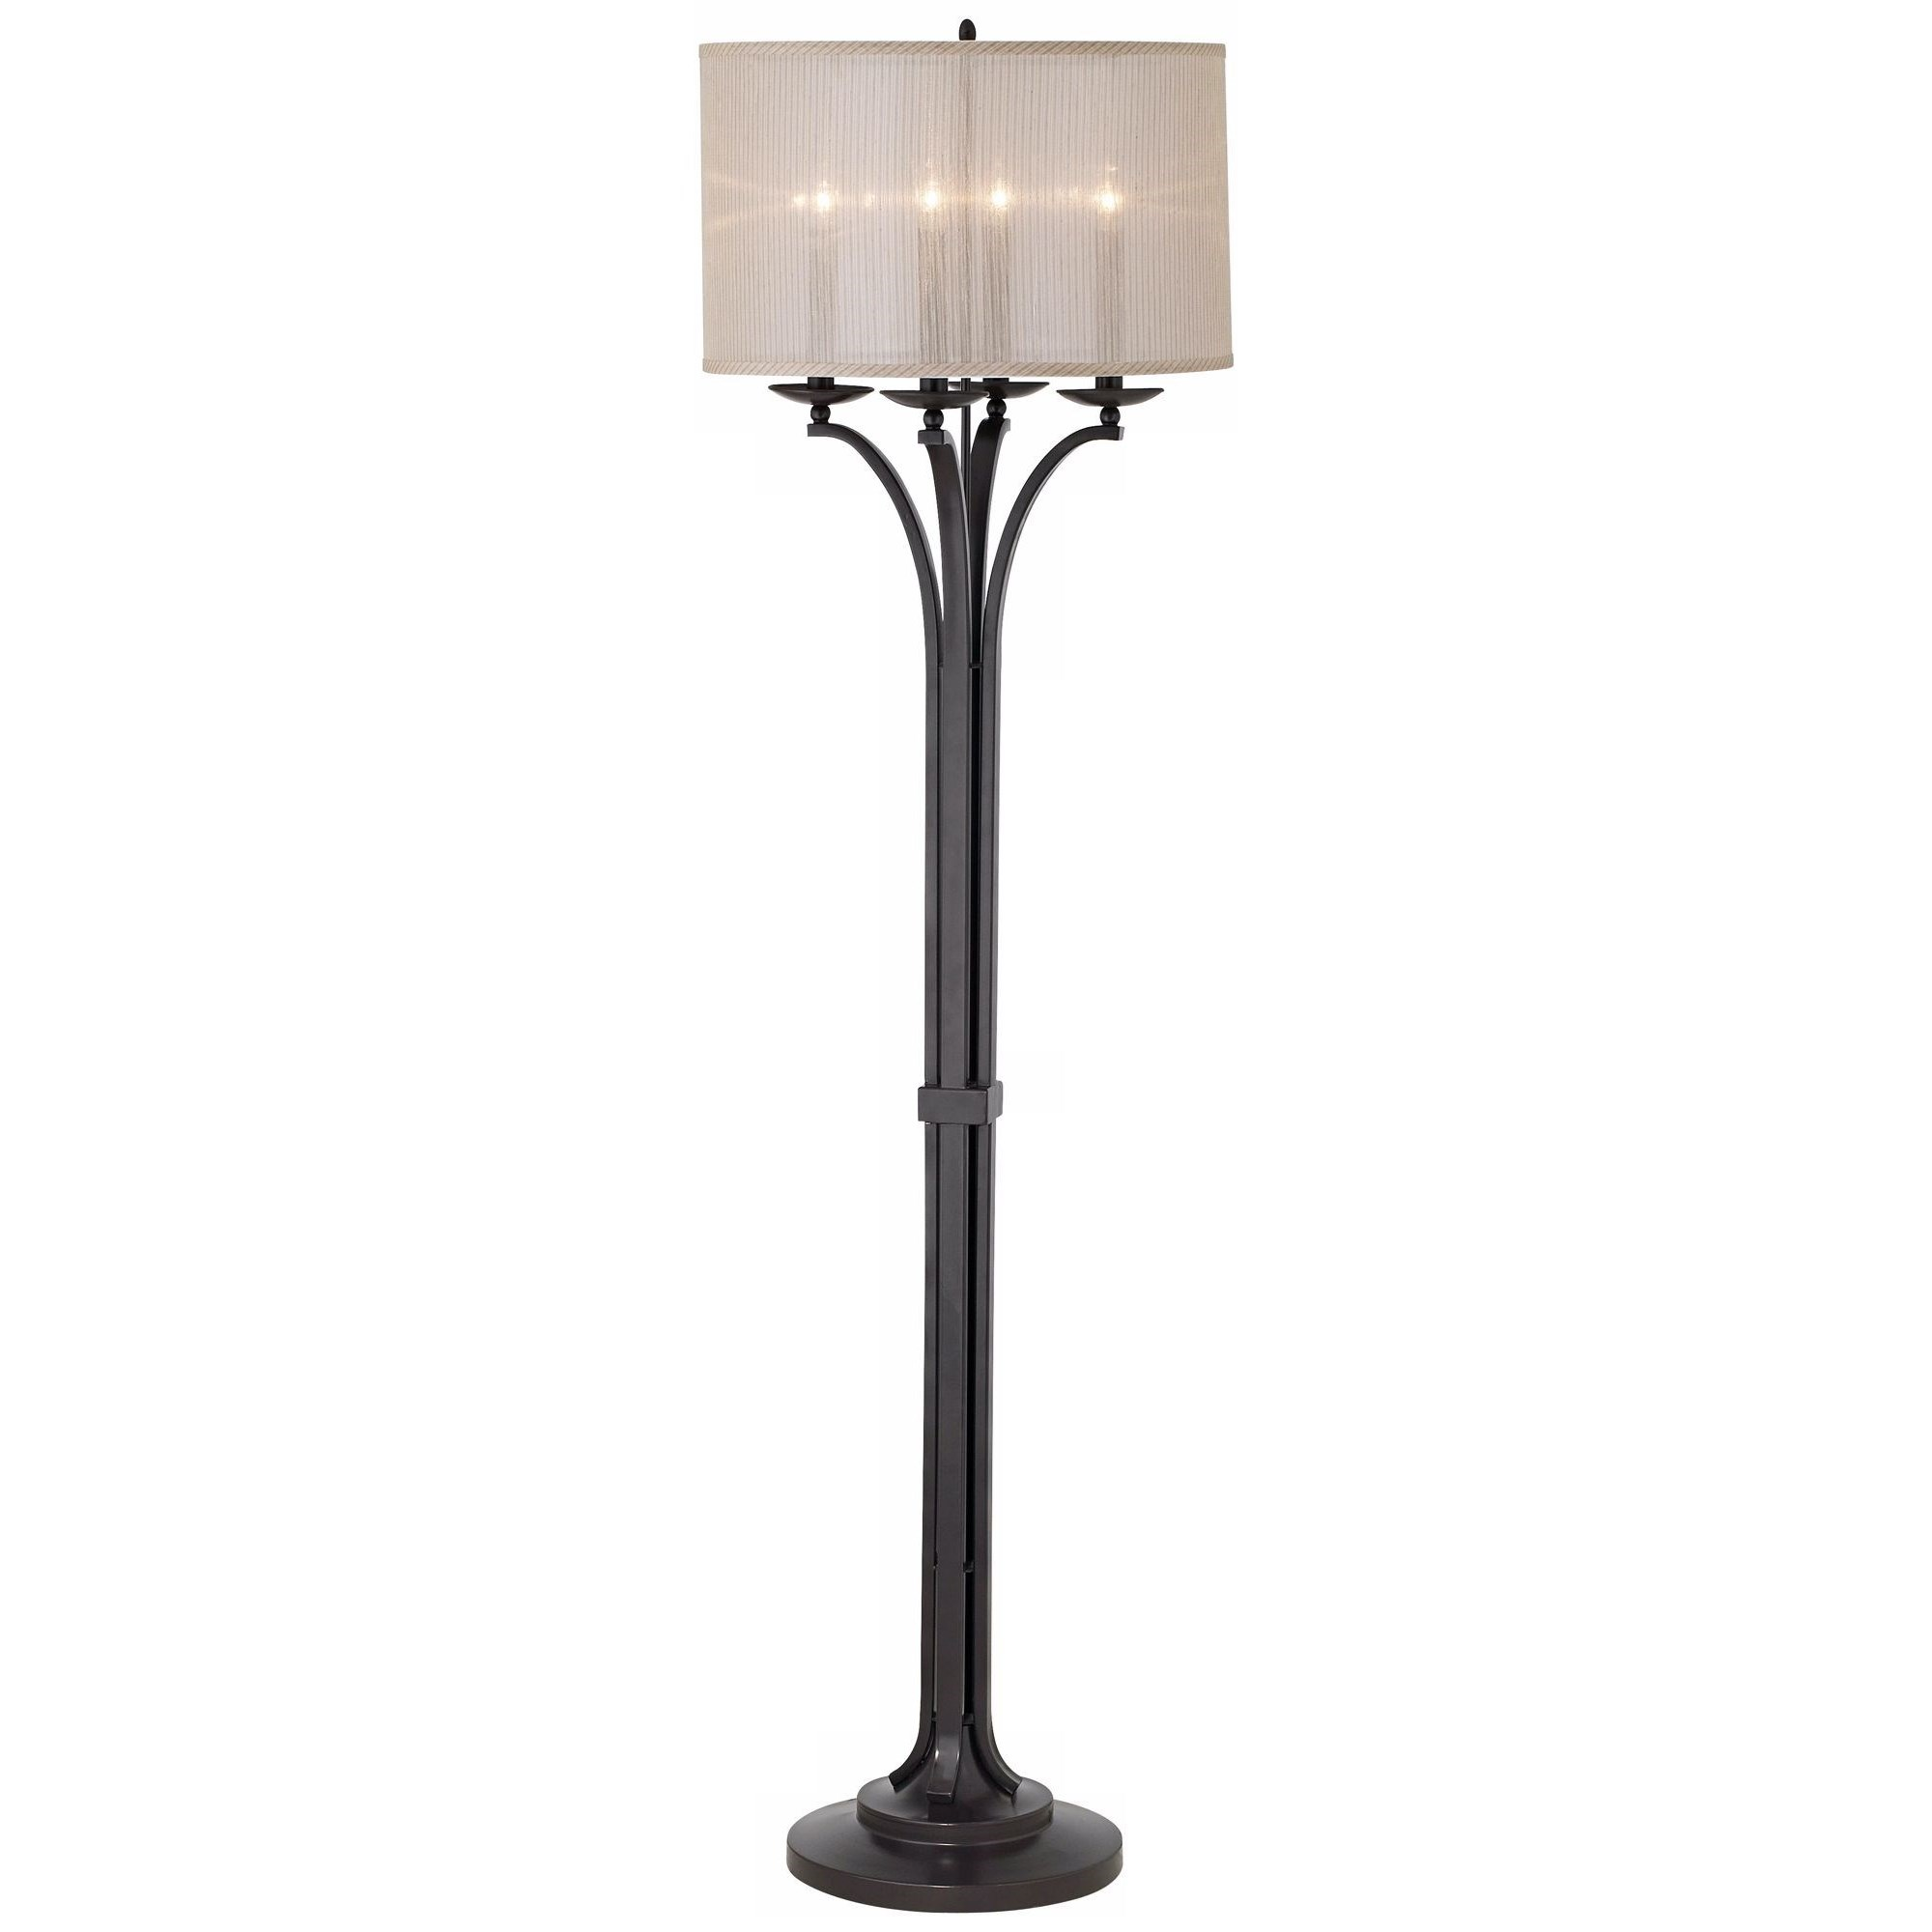 Kig Pennsylvania Country Floor Lamp